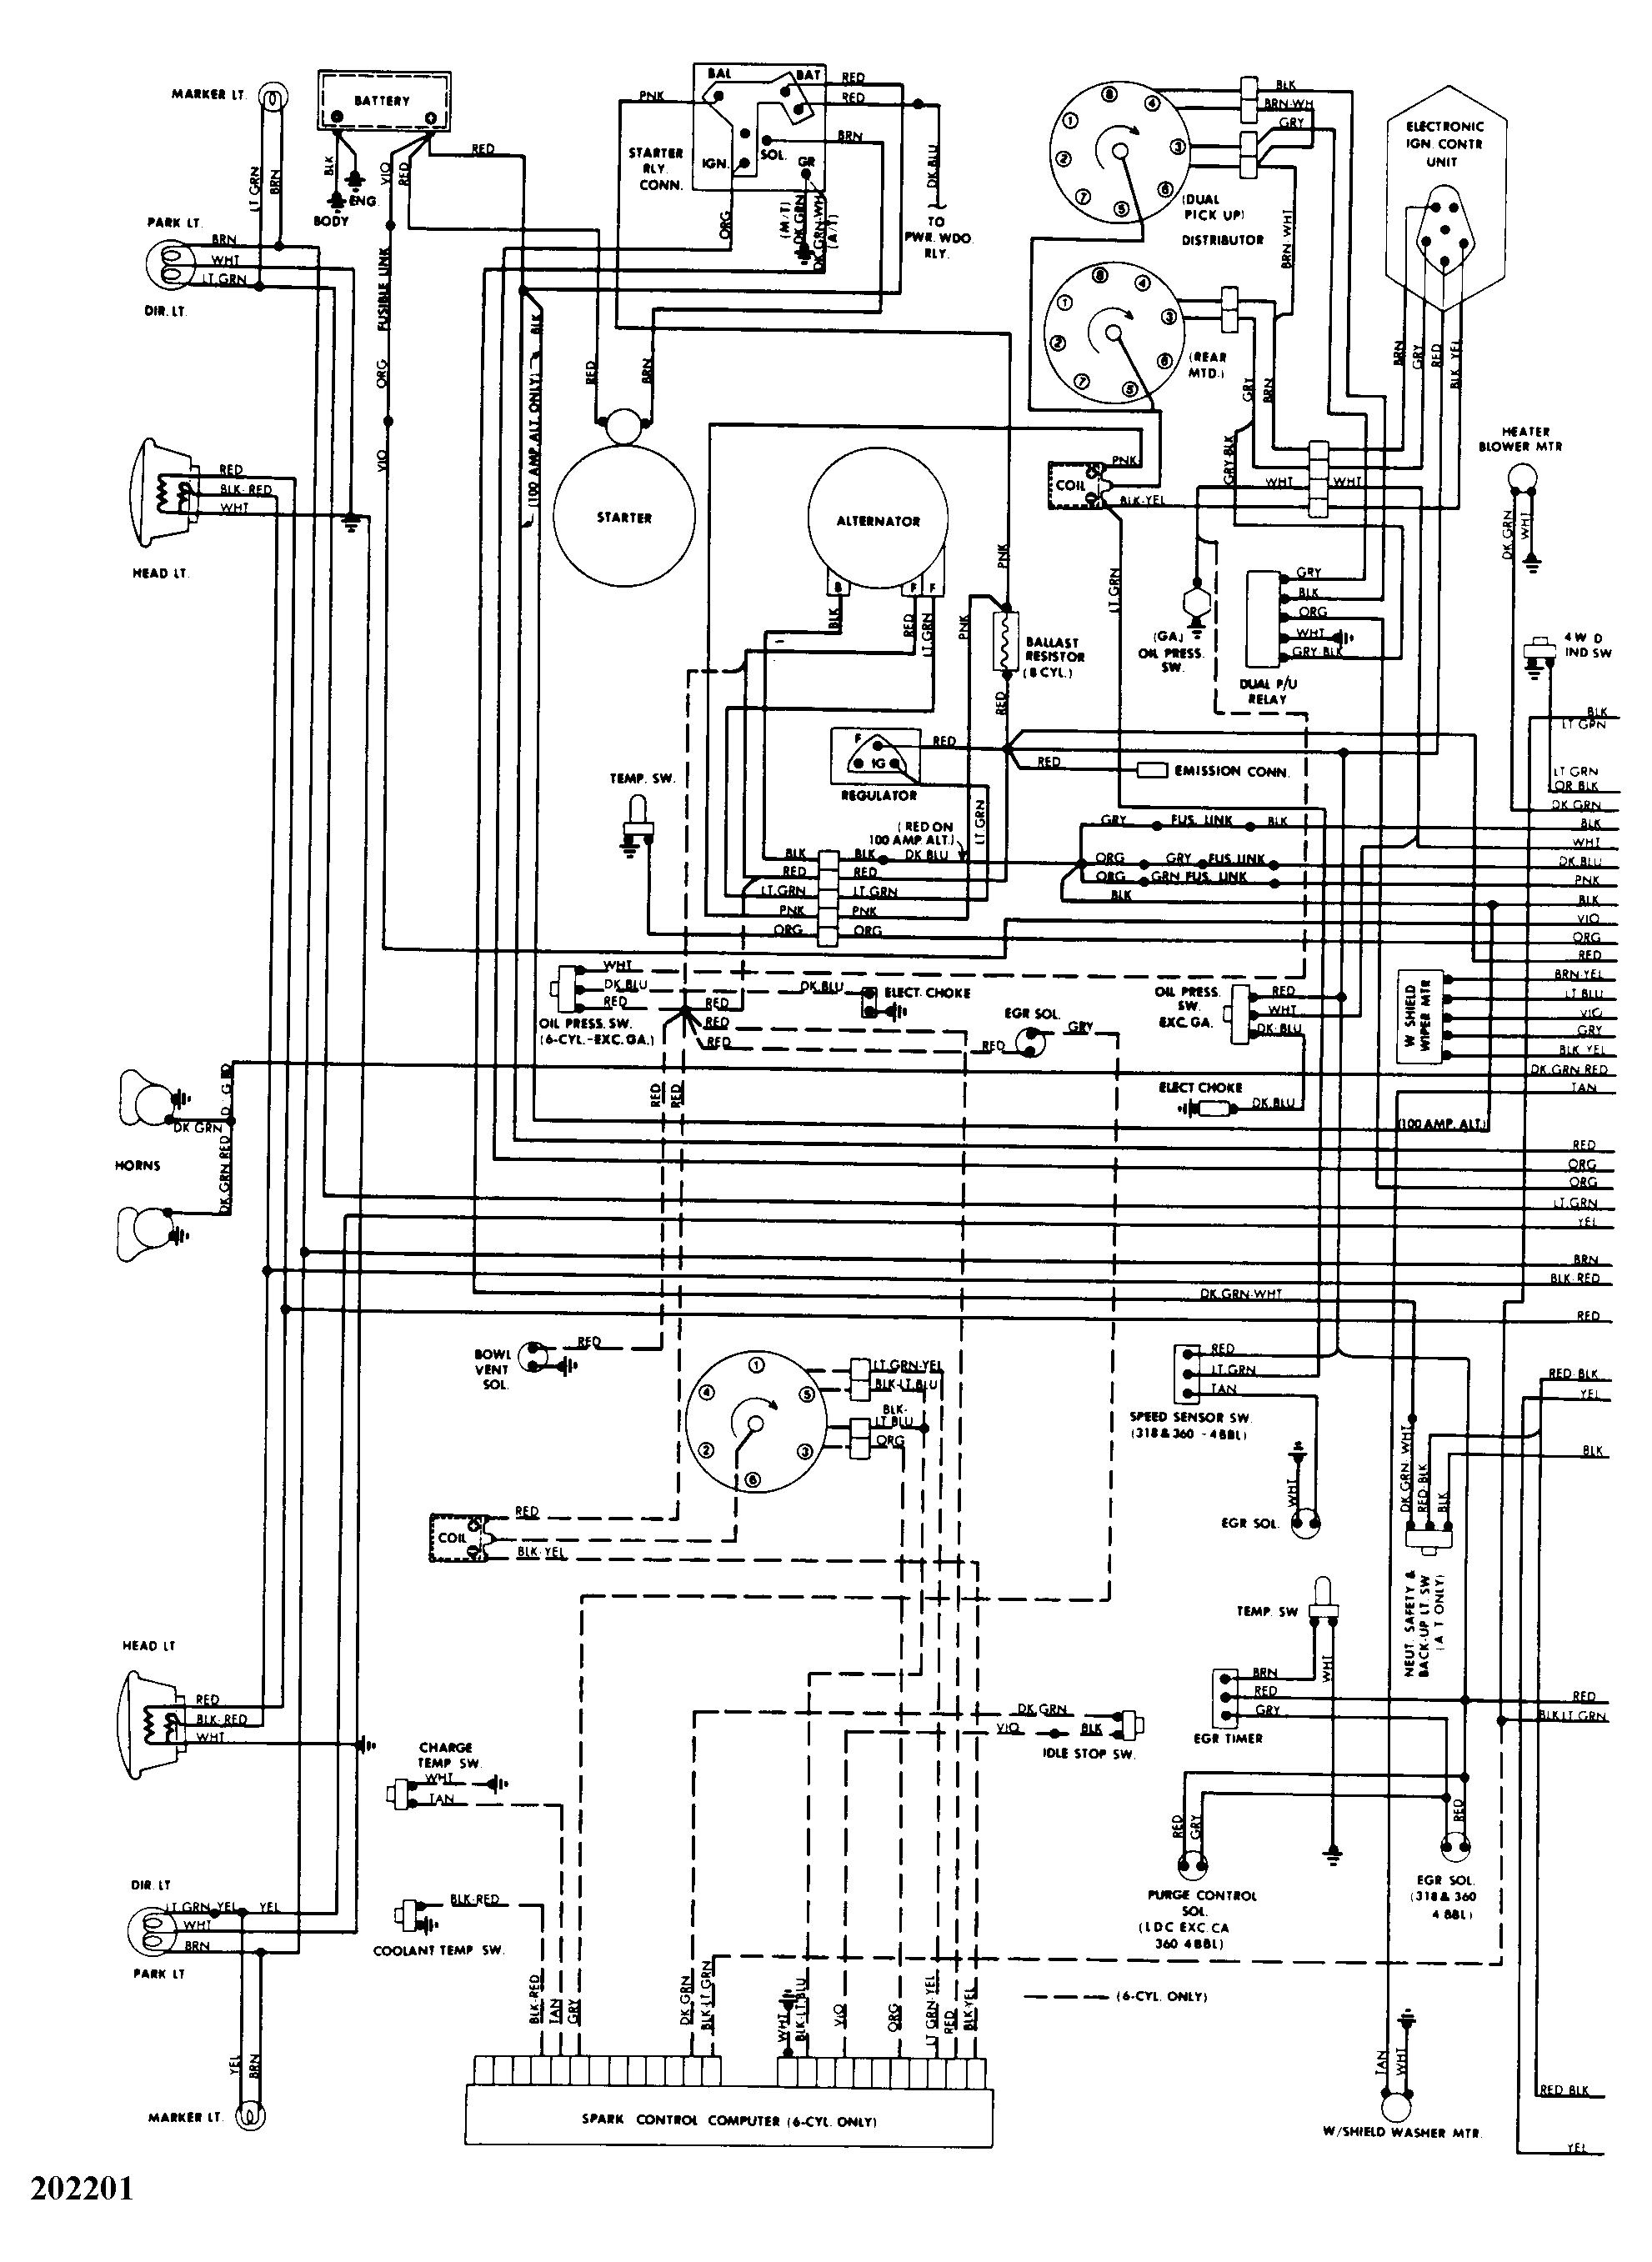 sprinter egr wiring diagram wiring diagram sheet mercedes sprinter wiring diagram ignition switch sprinter egr wiring